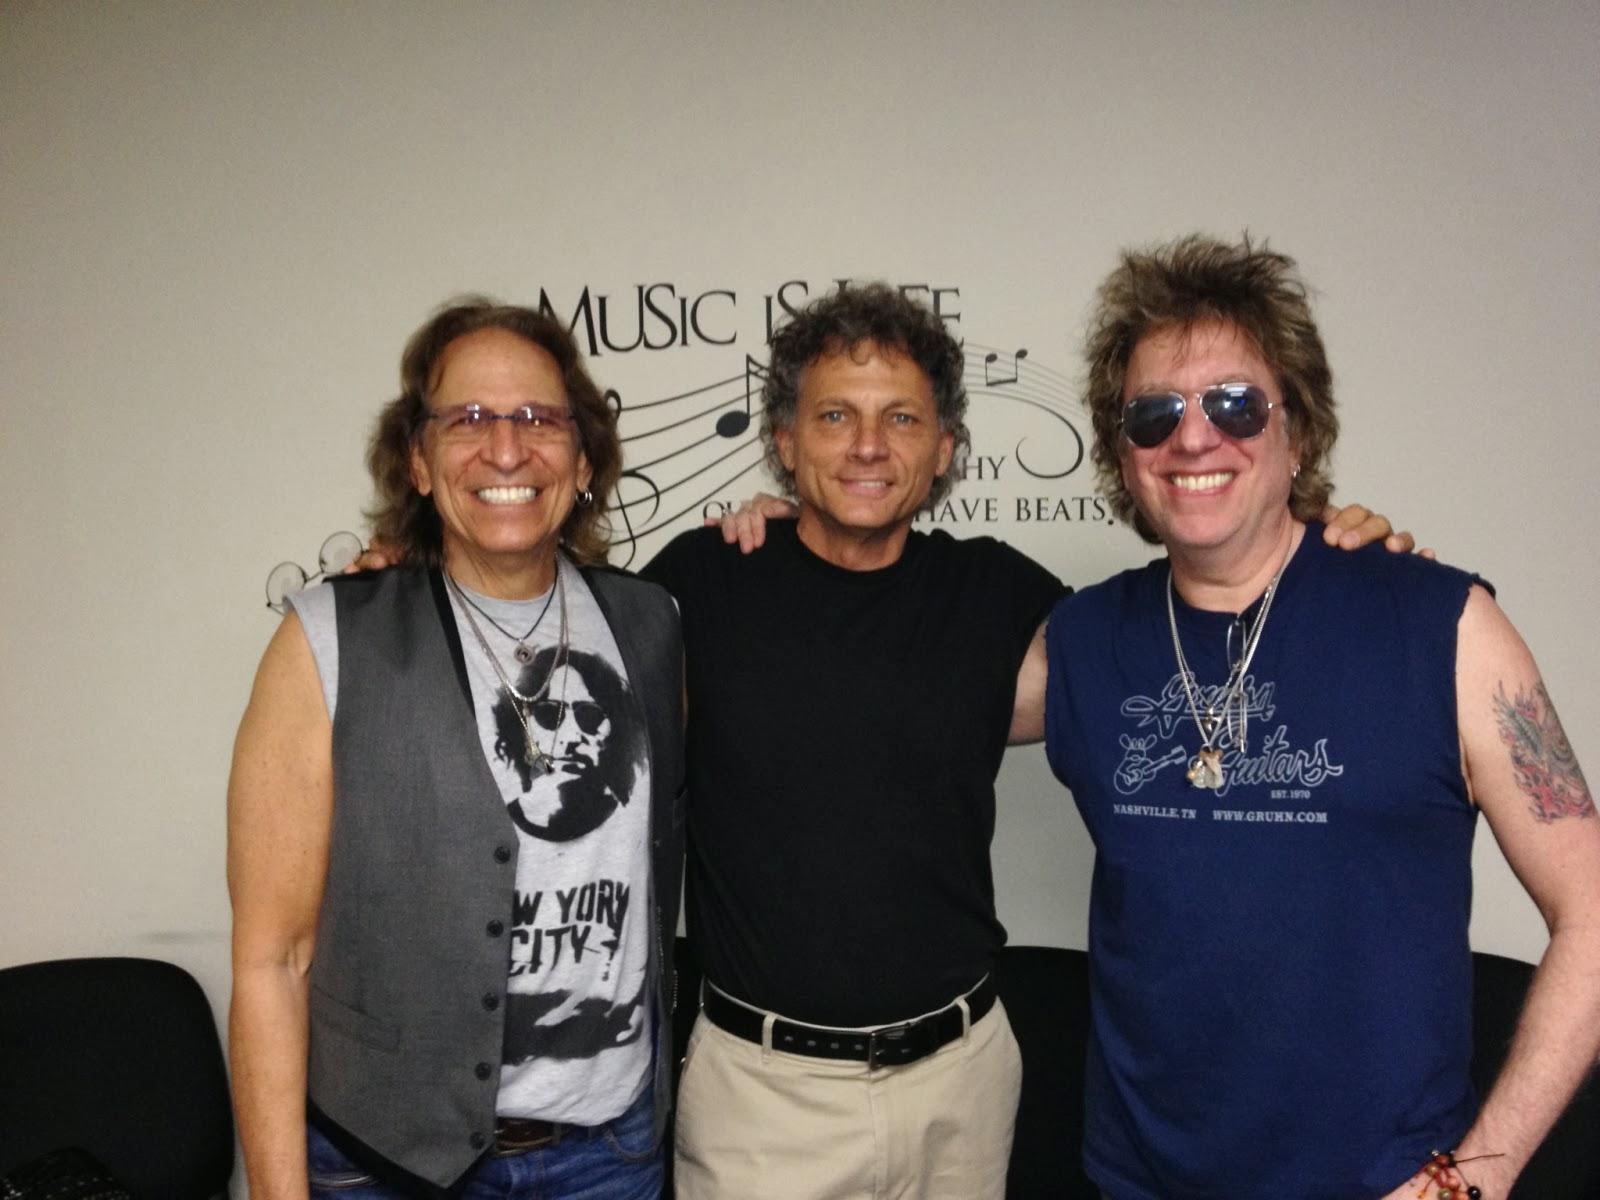 Richie Supa, Jimmy Stowe & Ricky Byrd